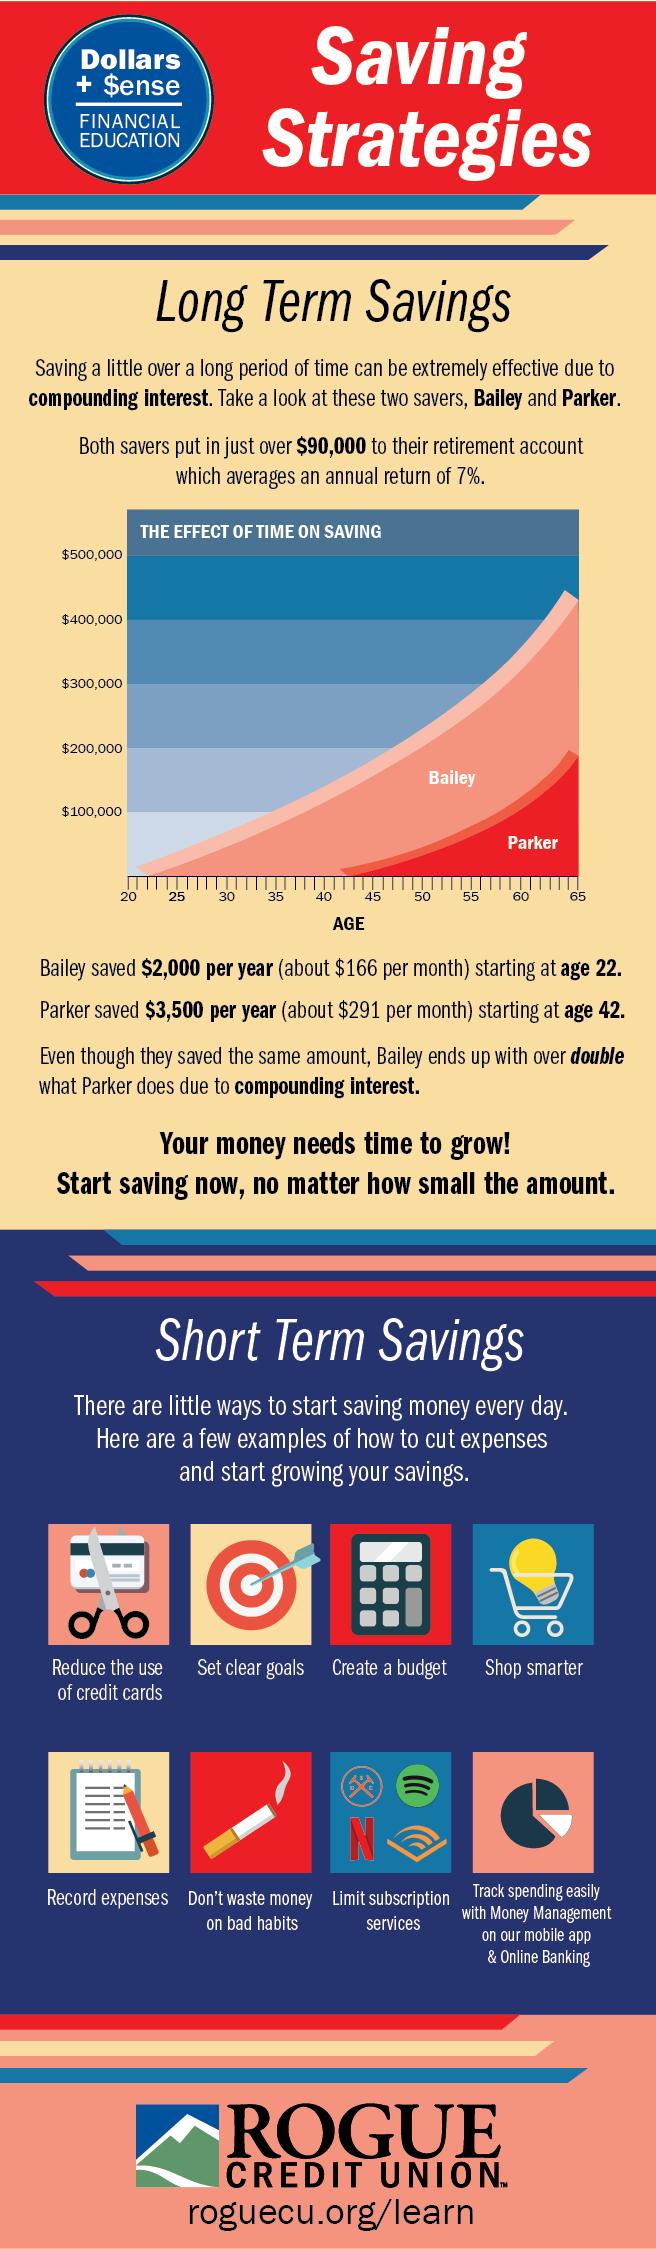 Dollar and Sense Info graph Saving Strategies